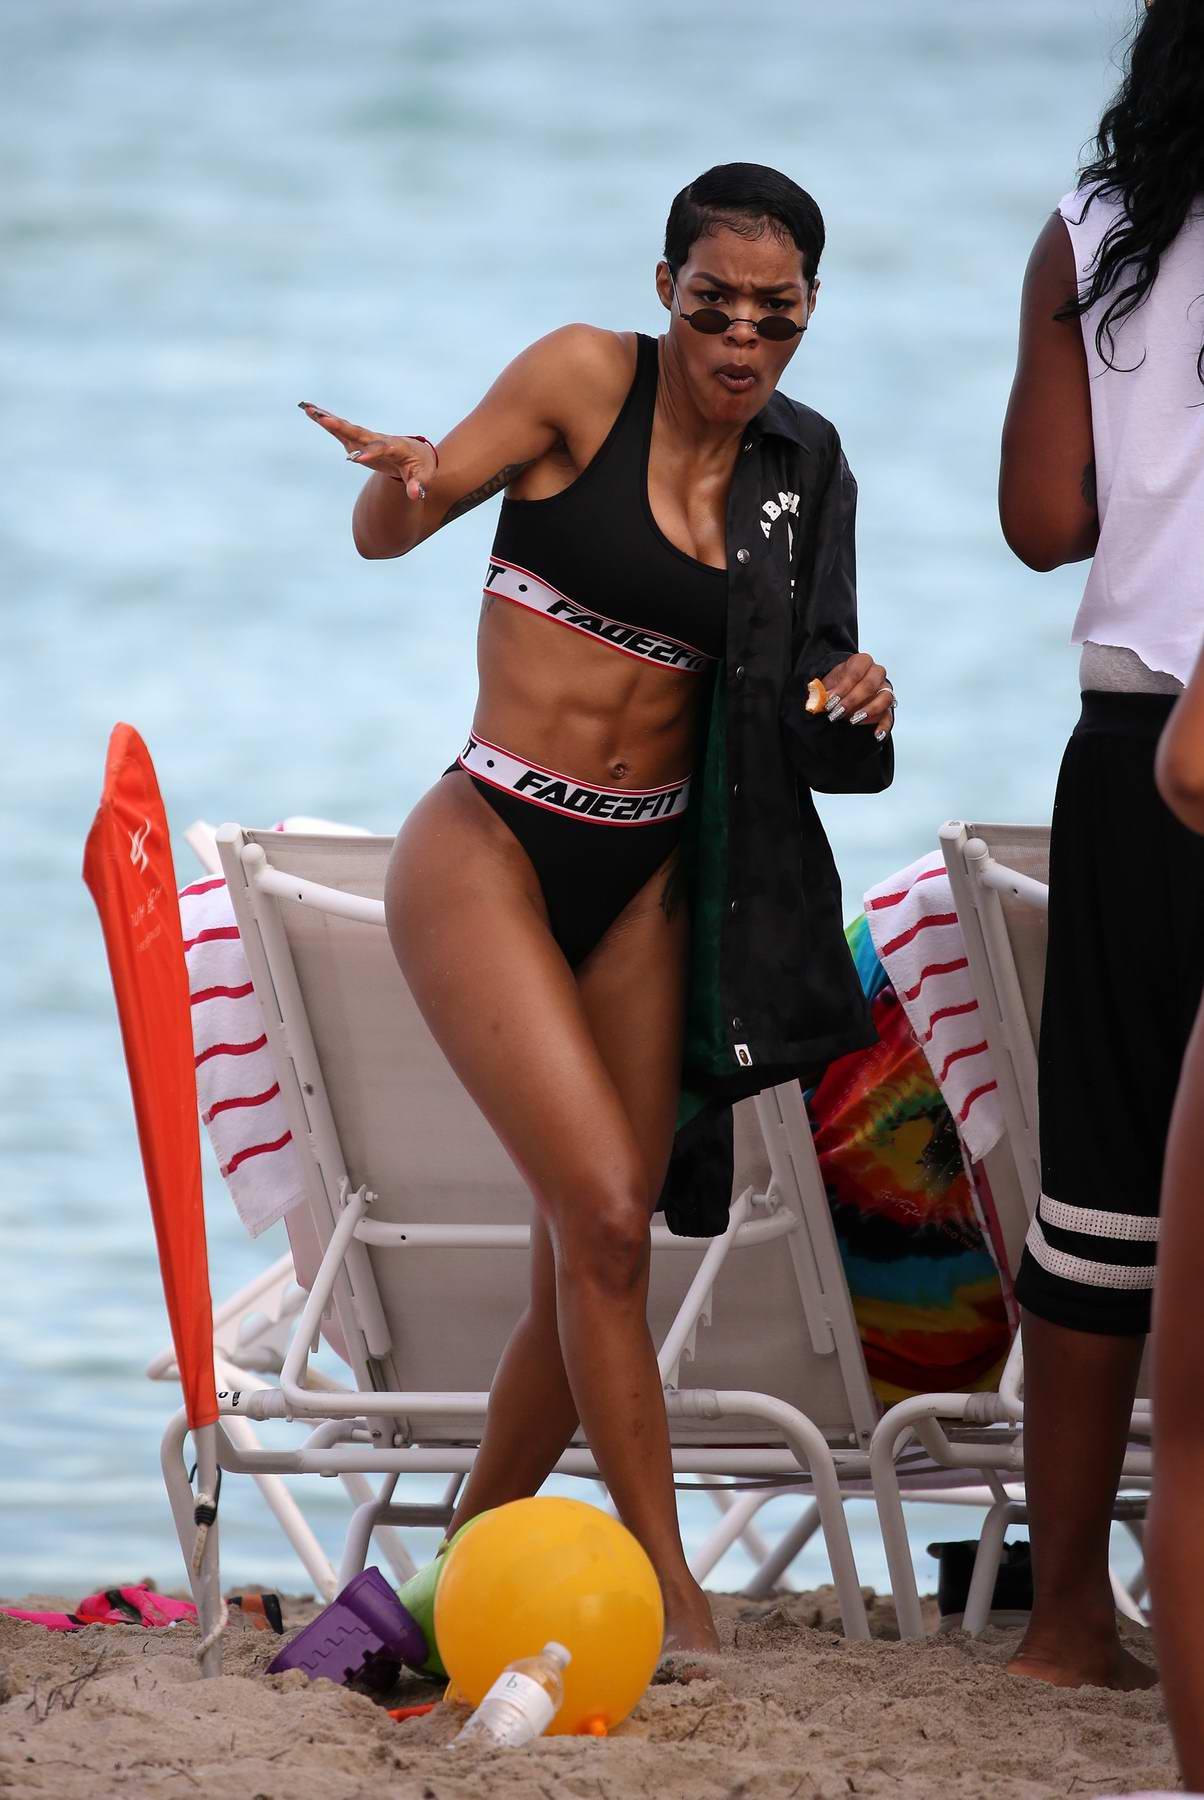 Teyana Taylor shows off her washboard abs as she hits the beach in black bikini in Miami, Florida